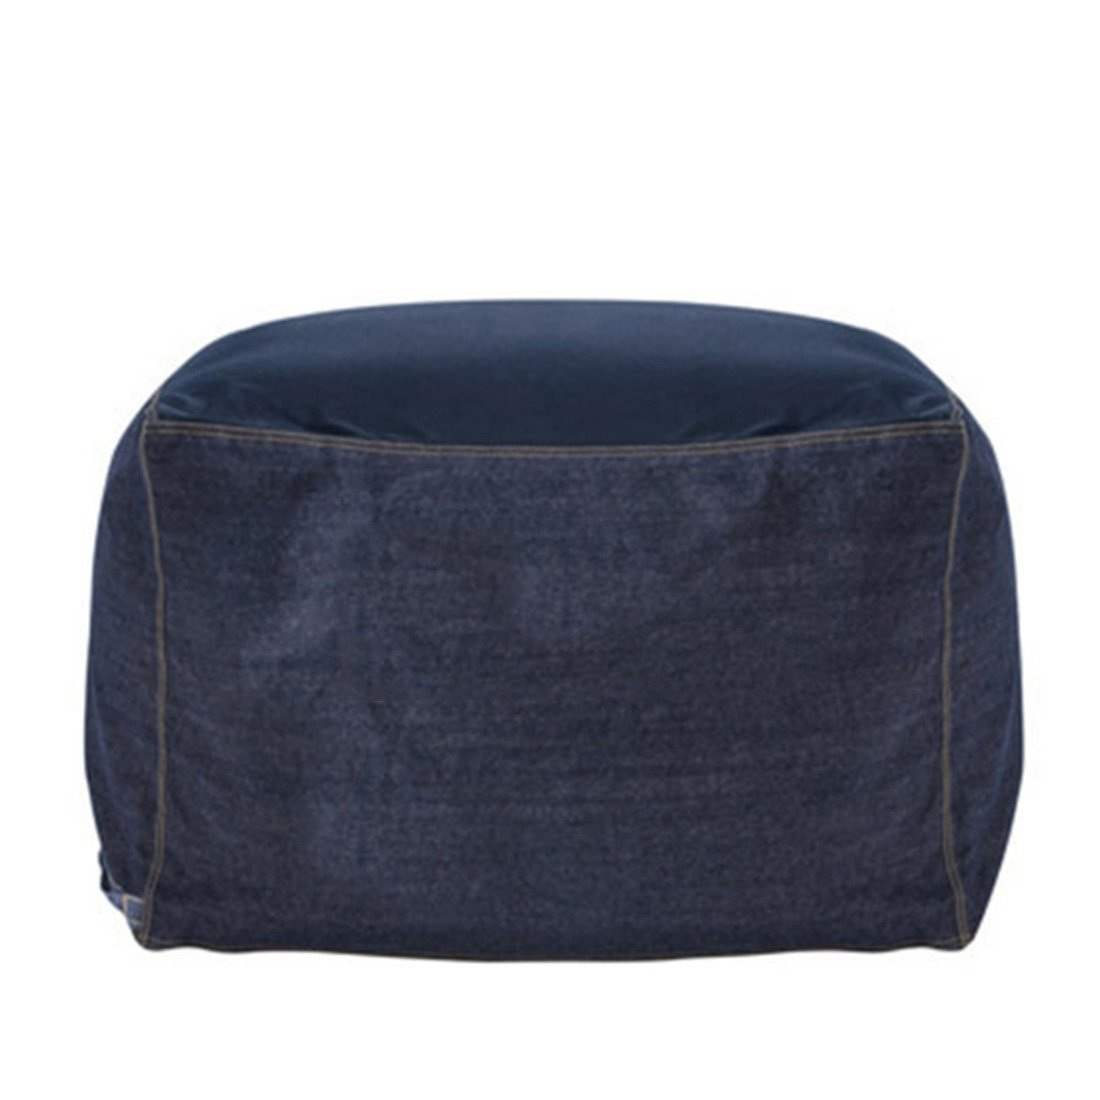 Jiyaru Bean Bag Chair Cover Sofa Cushion Beanbag Soft Cover Stuffed Animal Storage Bag Denim Blue L (Only Cover)